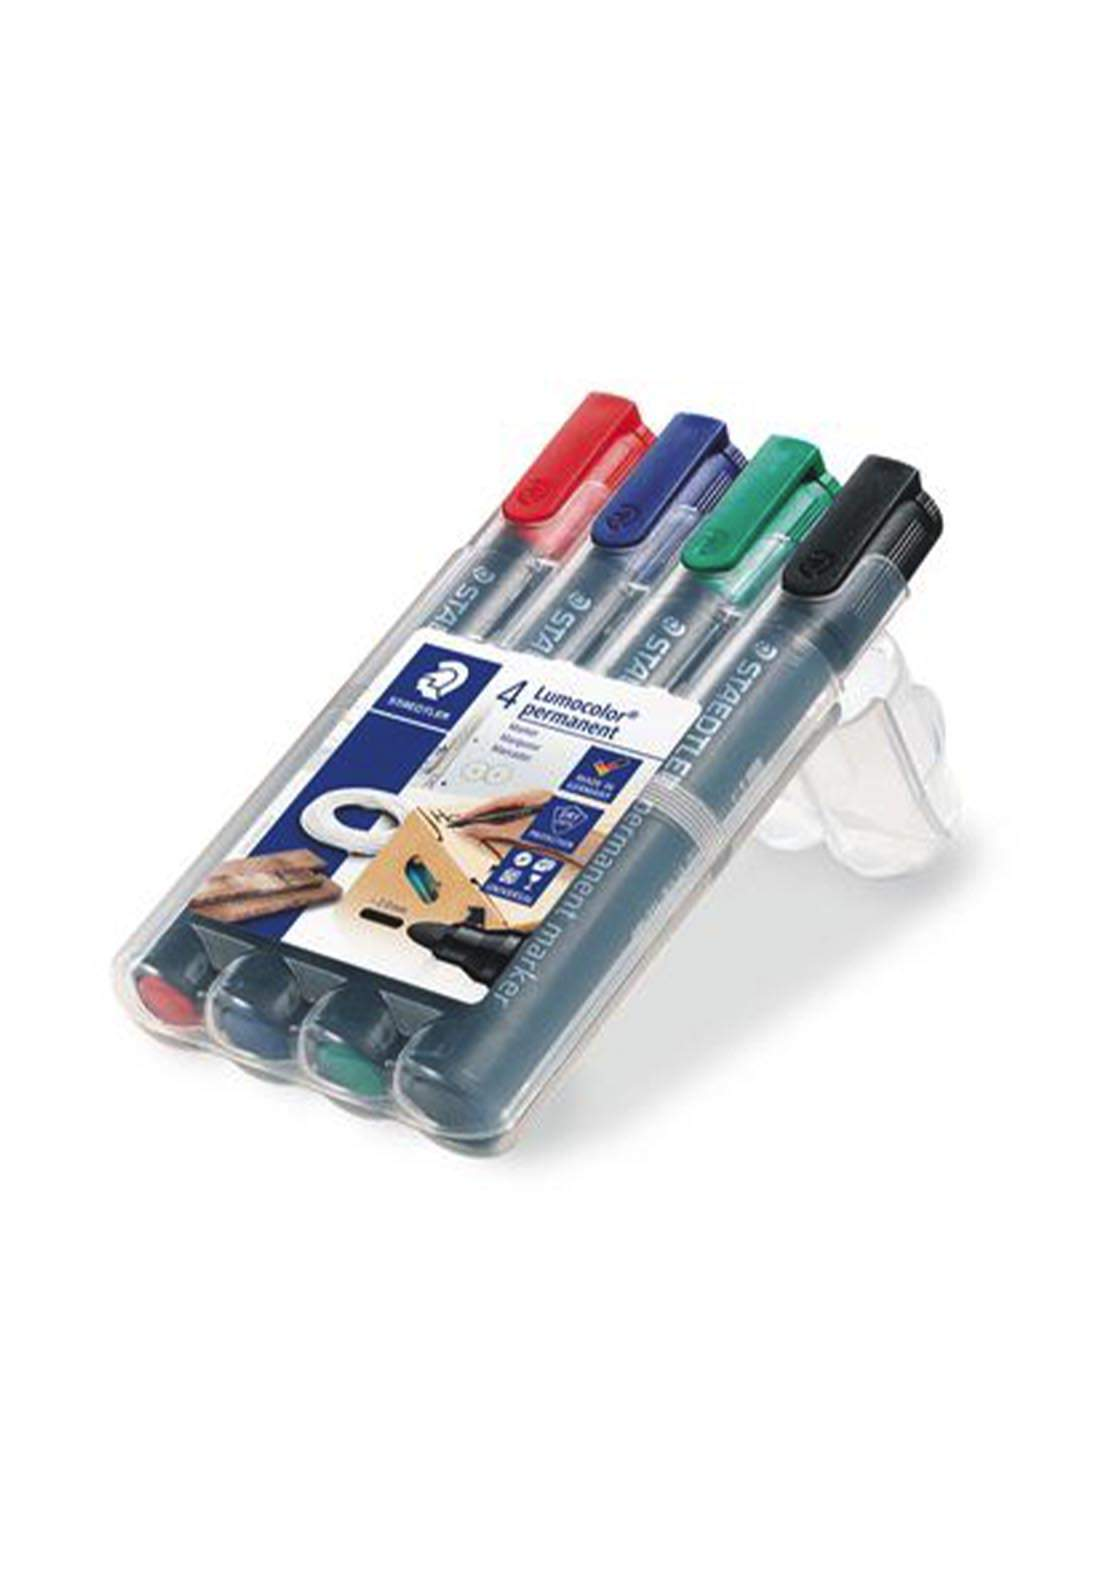 Staedtler 352 WP4  أقلام دائمية